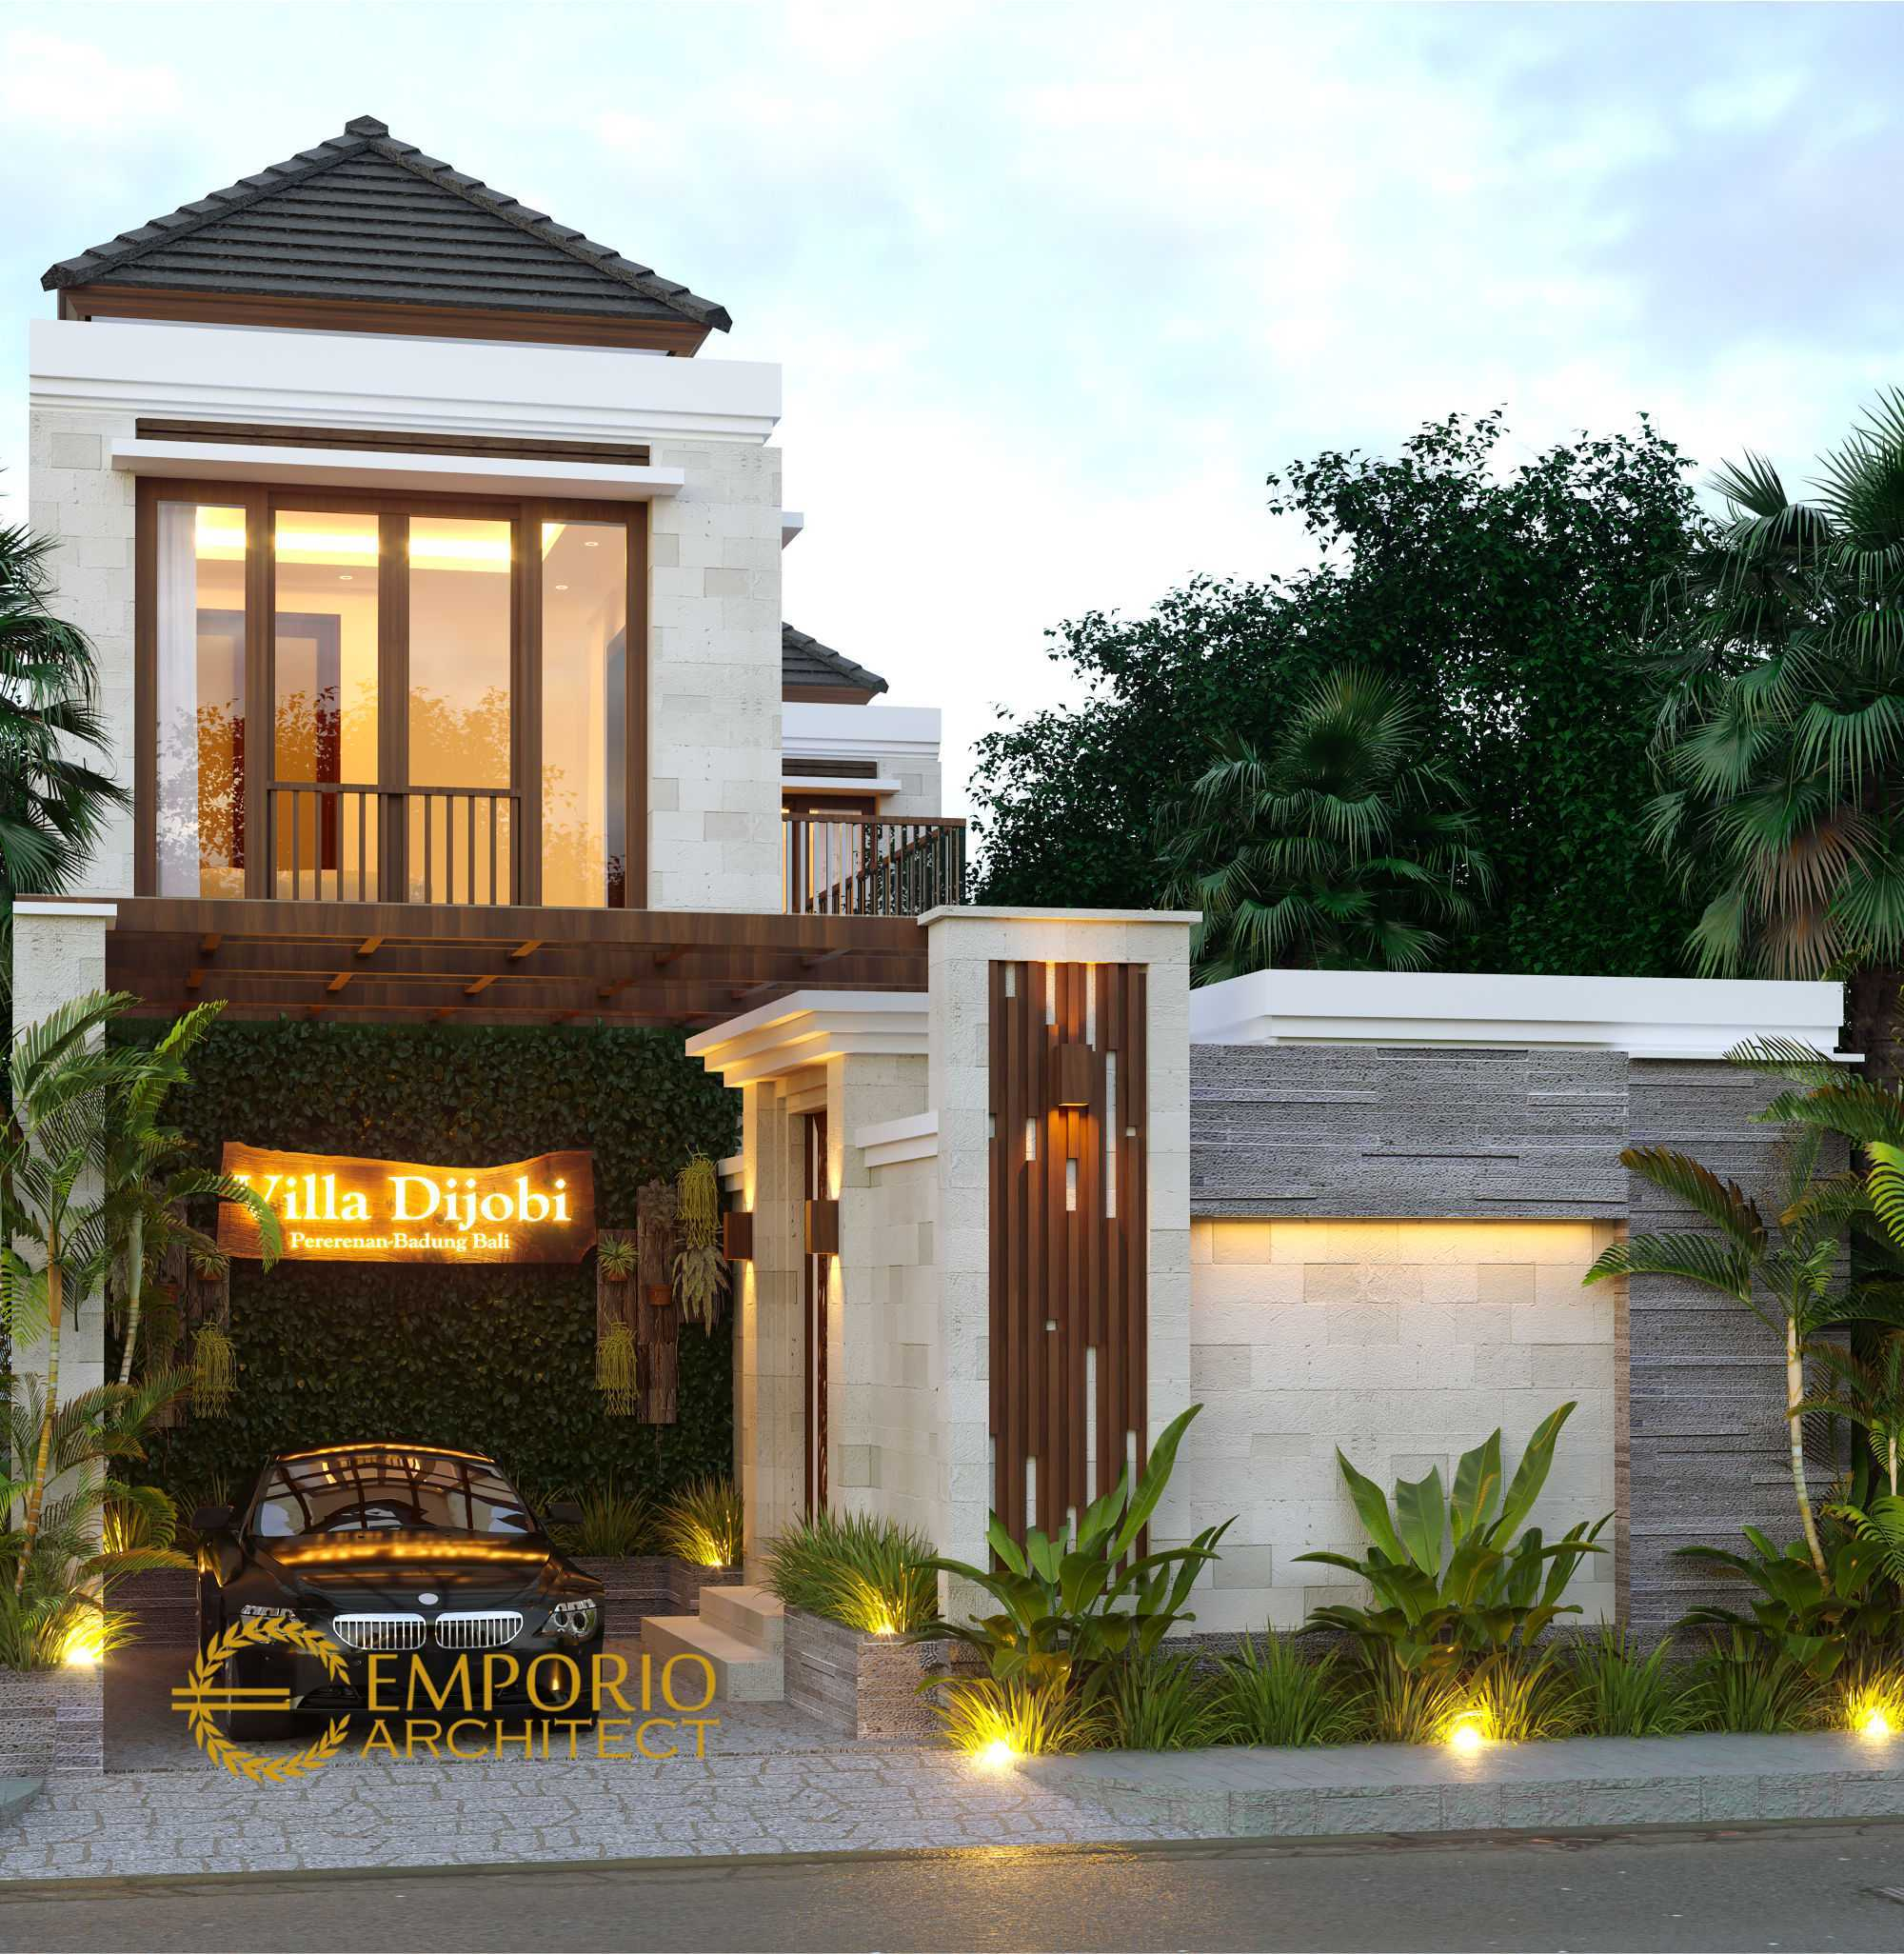 Emporio Architect Jasa Arsitek Bali Desain Villa Bali Tropis 649 @ Mengwi, Badung, Bali Mengwi, Kec. Mengwi, Kabupaten Badung, Bali, Indonesia Mengwi, Kec. Mengwi, Kabupaten Badung, Bali, Indonesia Emporio-Architect-Jasa-Arsitek-Bali-Desain-Villa-Bali-Tropis-649-Mengwi-Badung-Bali Tropical 79915